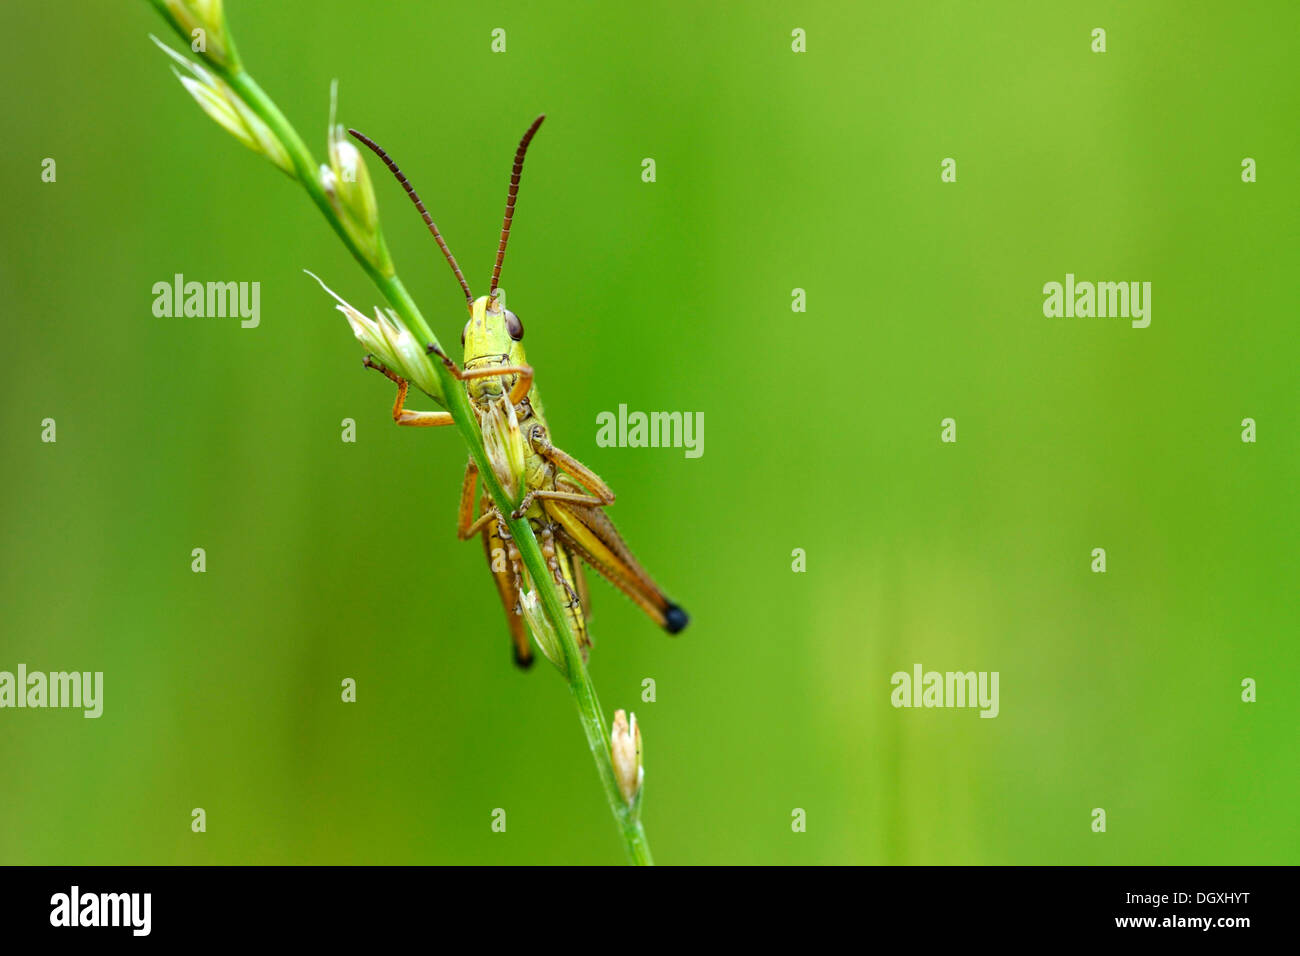 Green Grashopper (Mecostethus parapleurus), on blade of grass, Menzingen, Switzerland, Europe - Stock Image